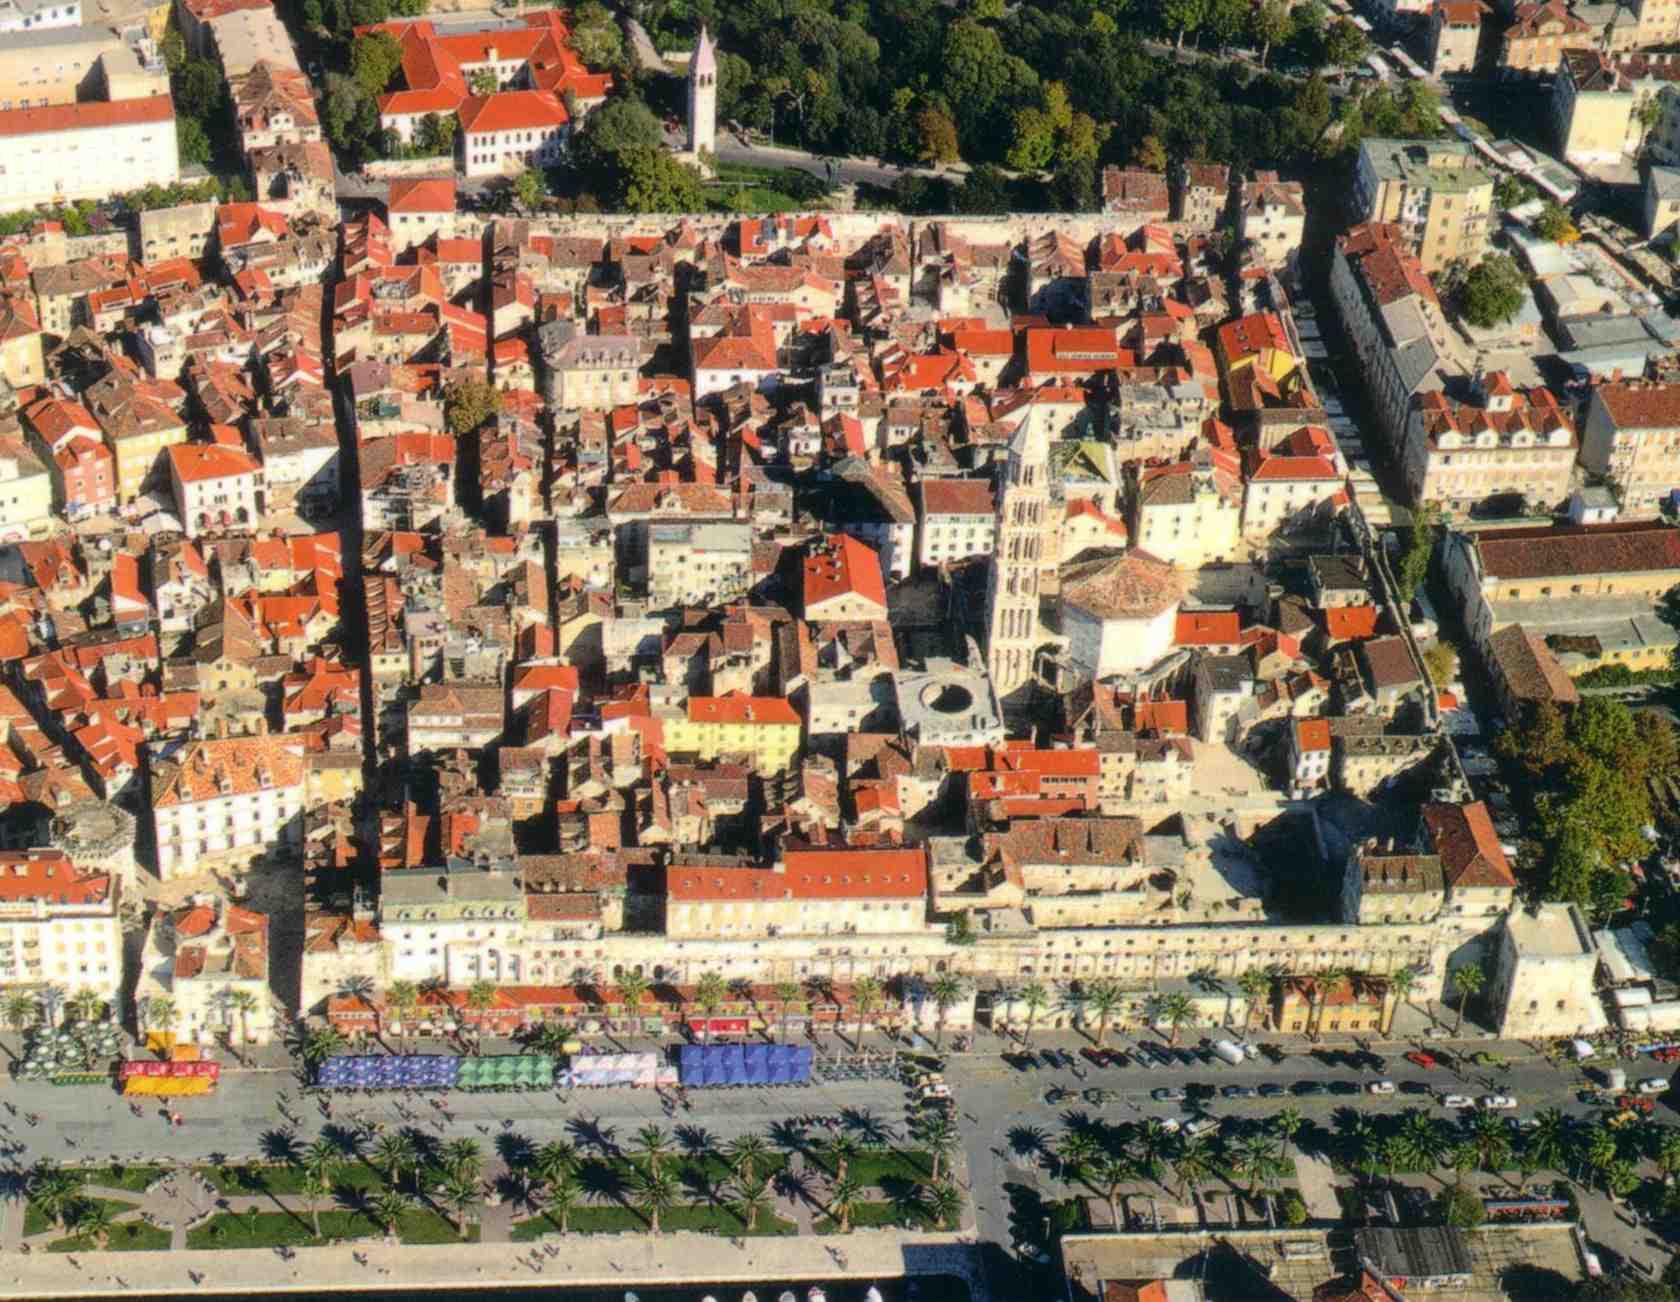 http://inavukic.files.wordpress.com/2012/04/split-diocletians_palace_air.jpg